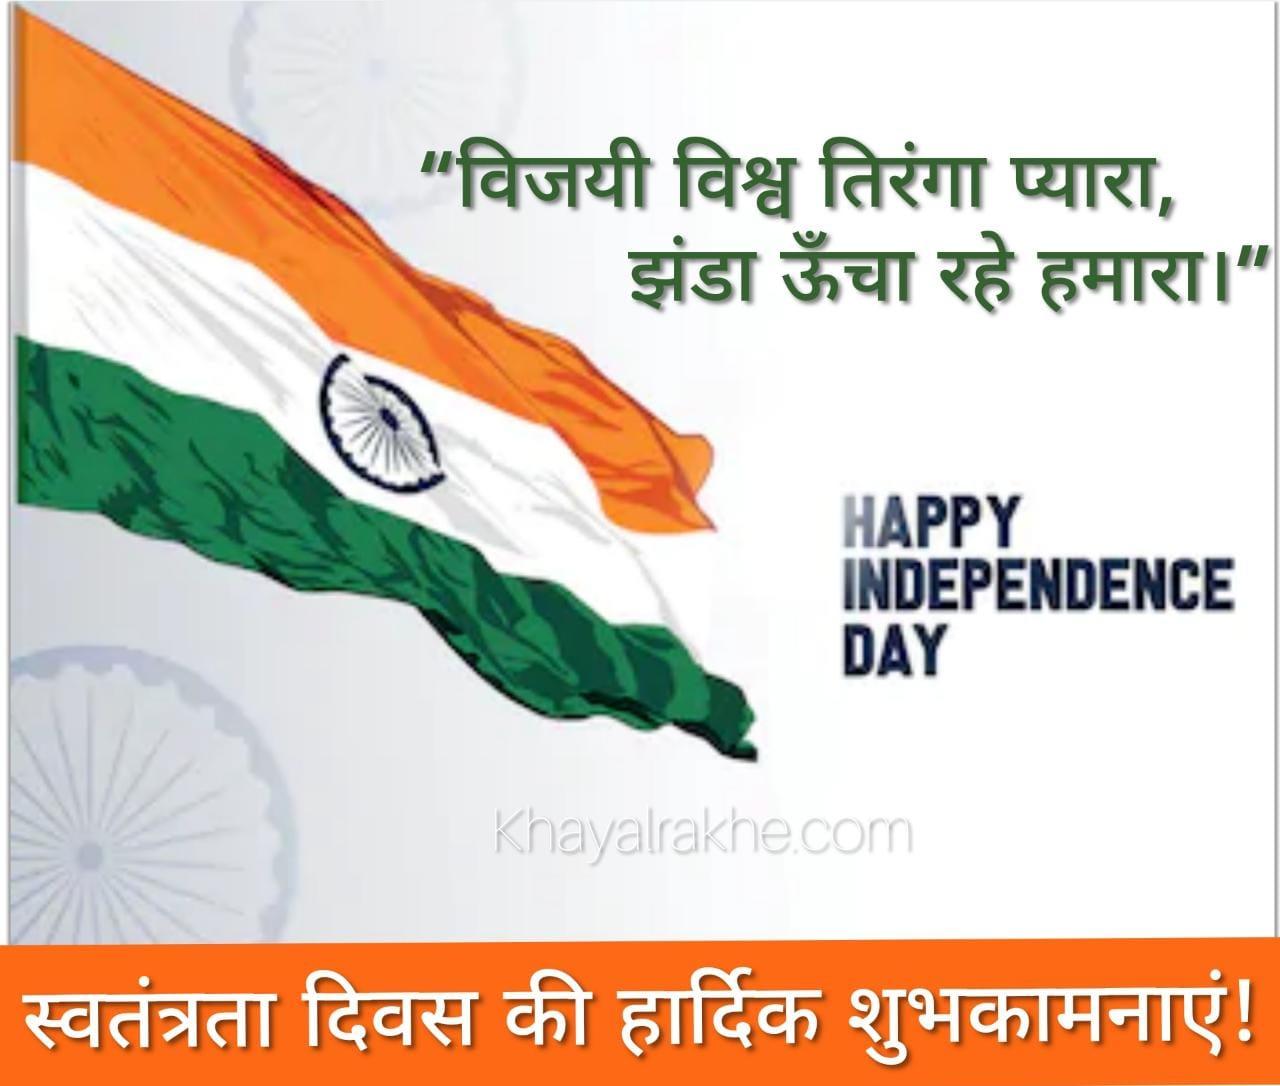 Independence Day Status, 15 August ke Status